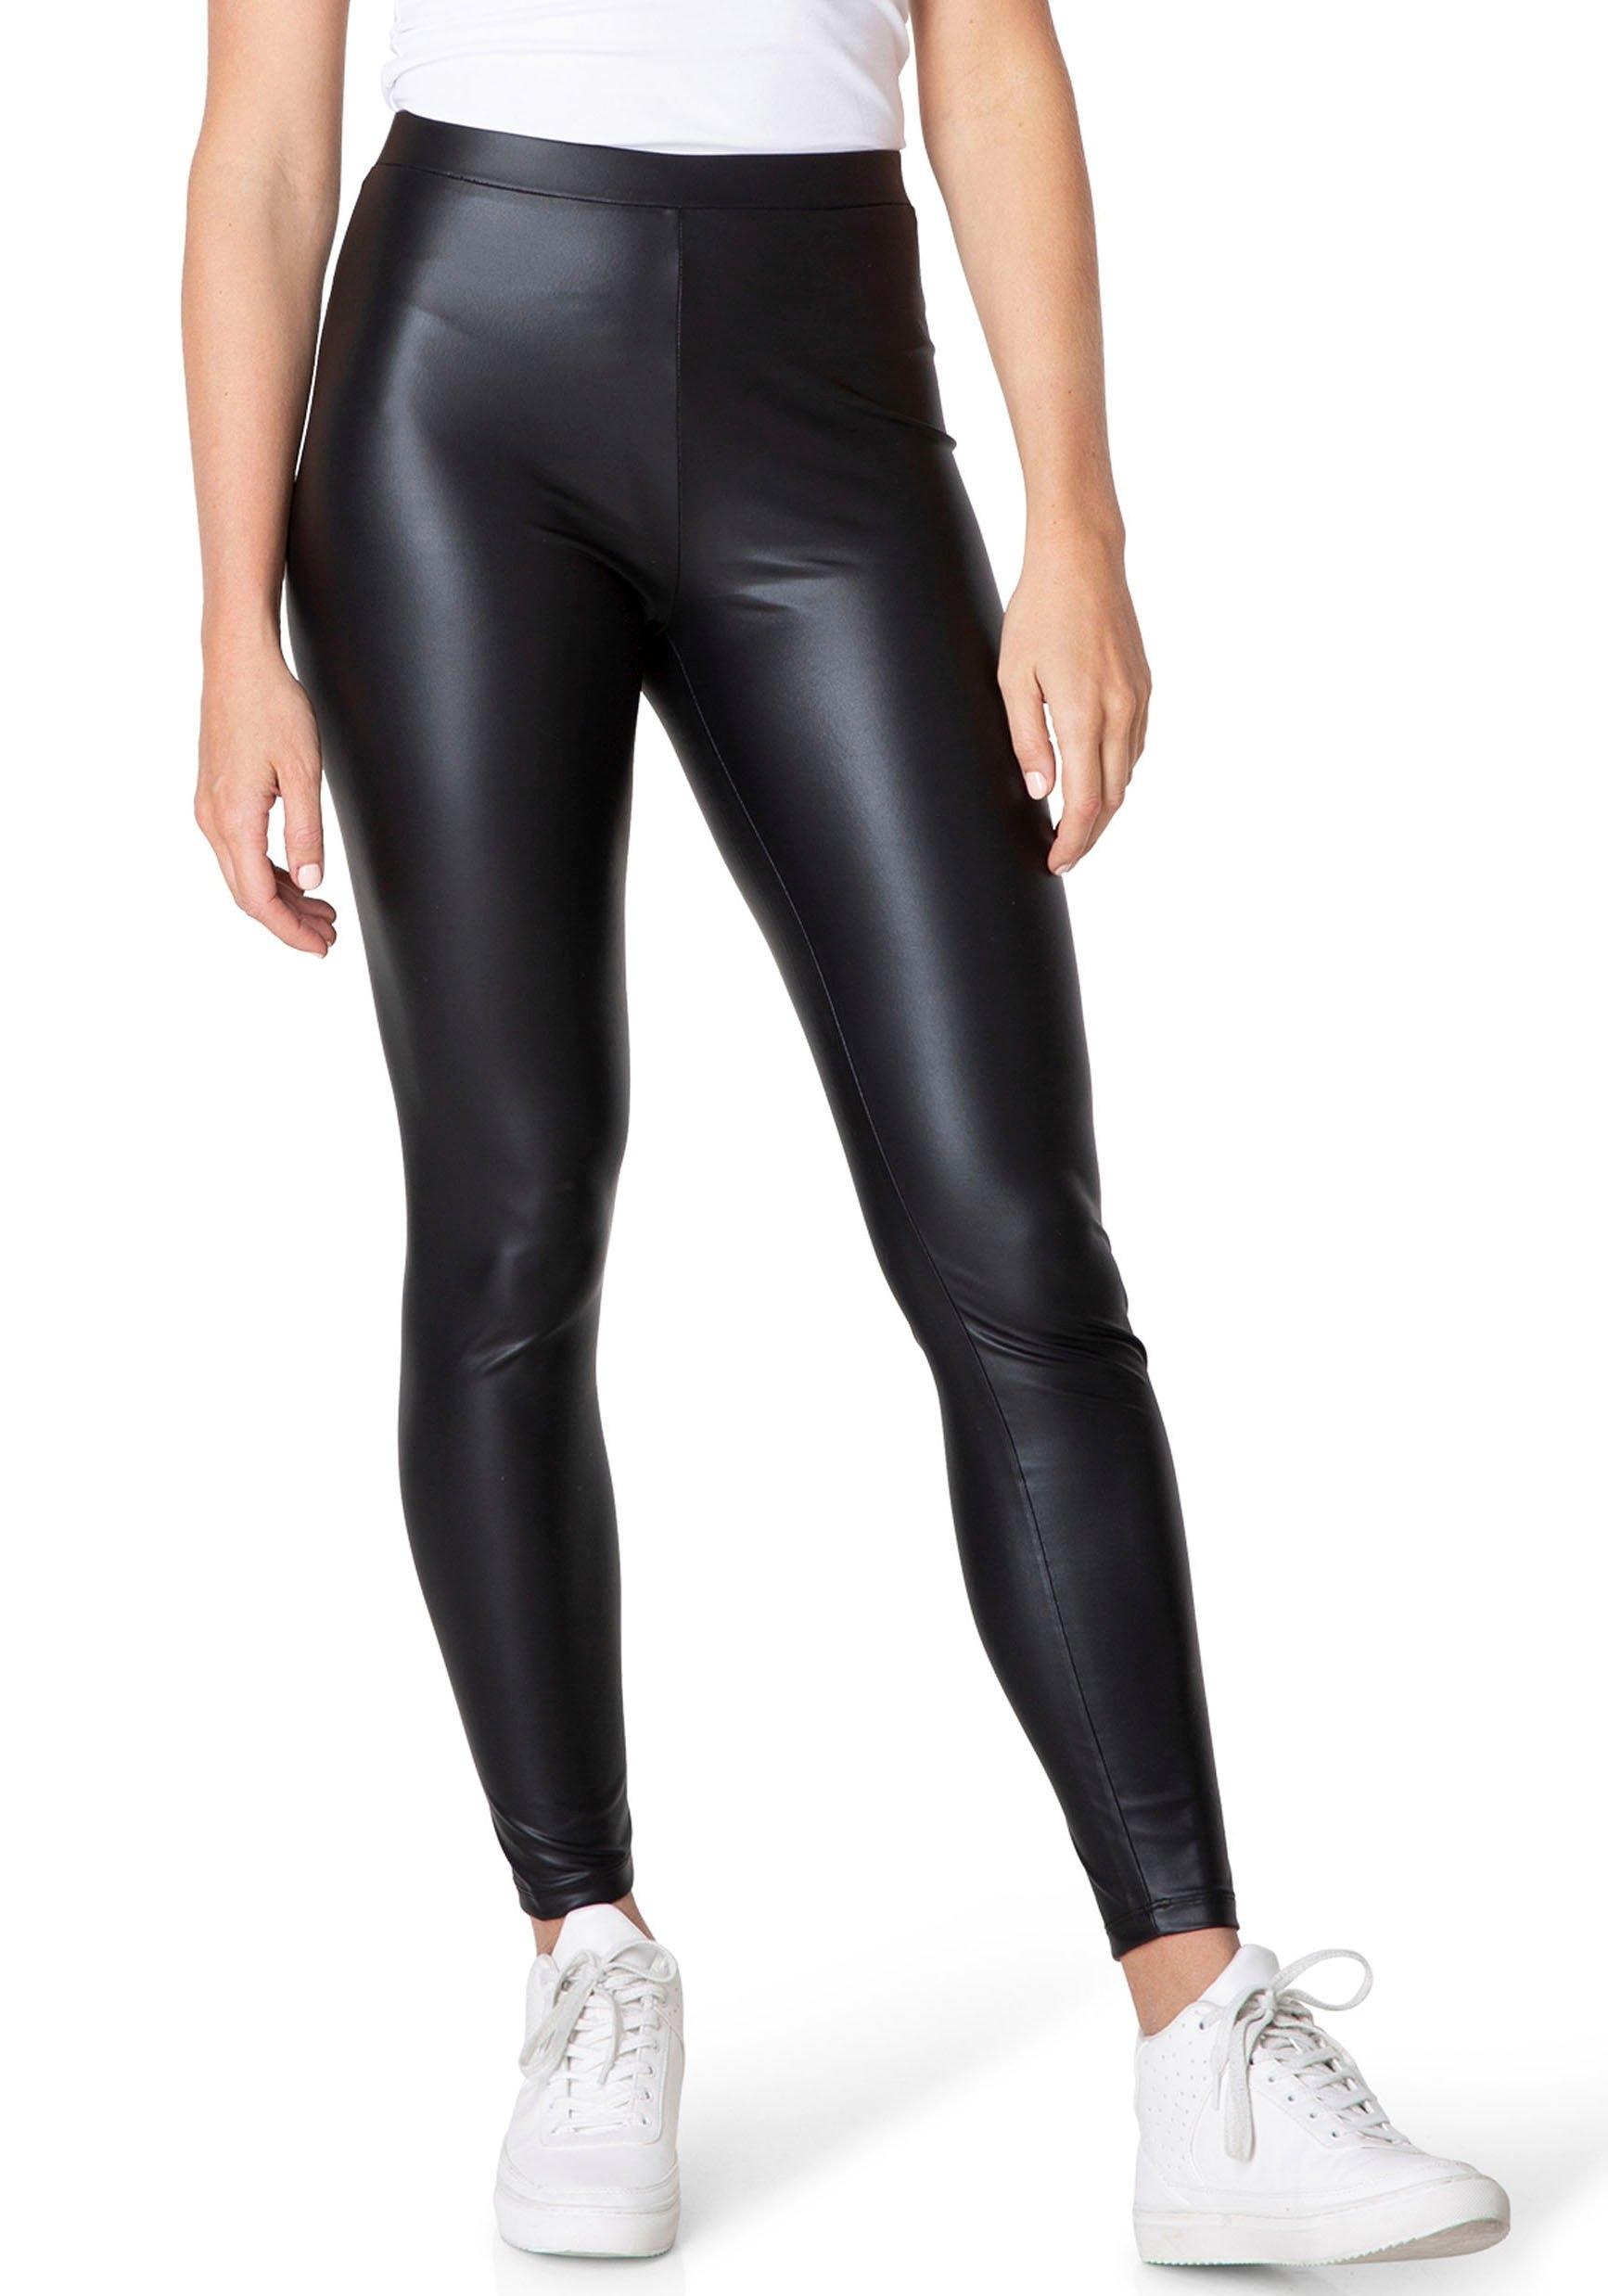 BSIC by Yest legging »Ysabel« voordelig en veilig online kopen